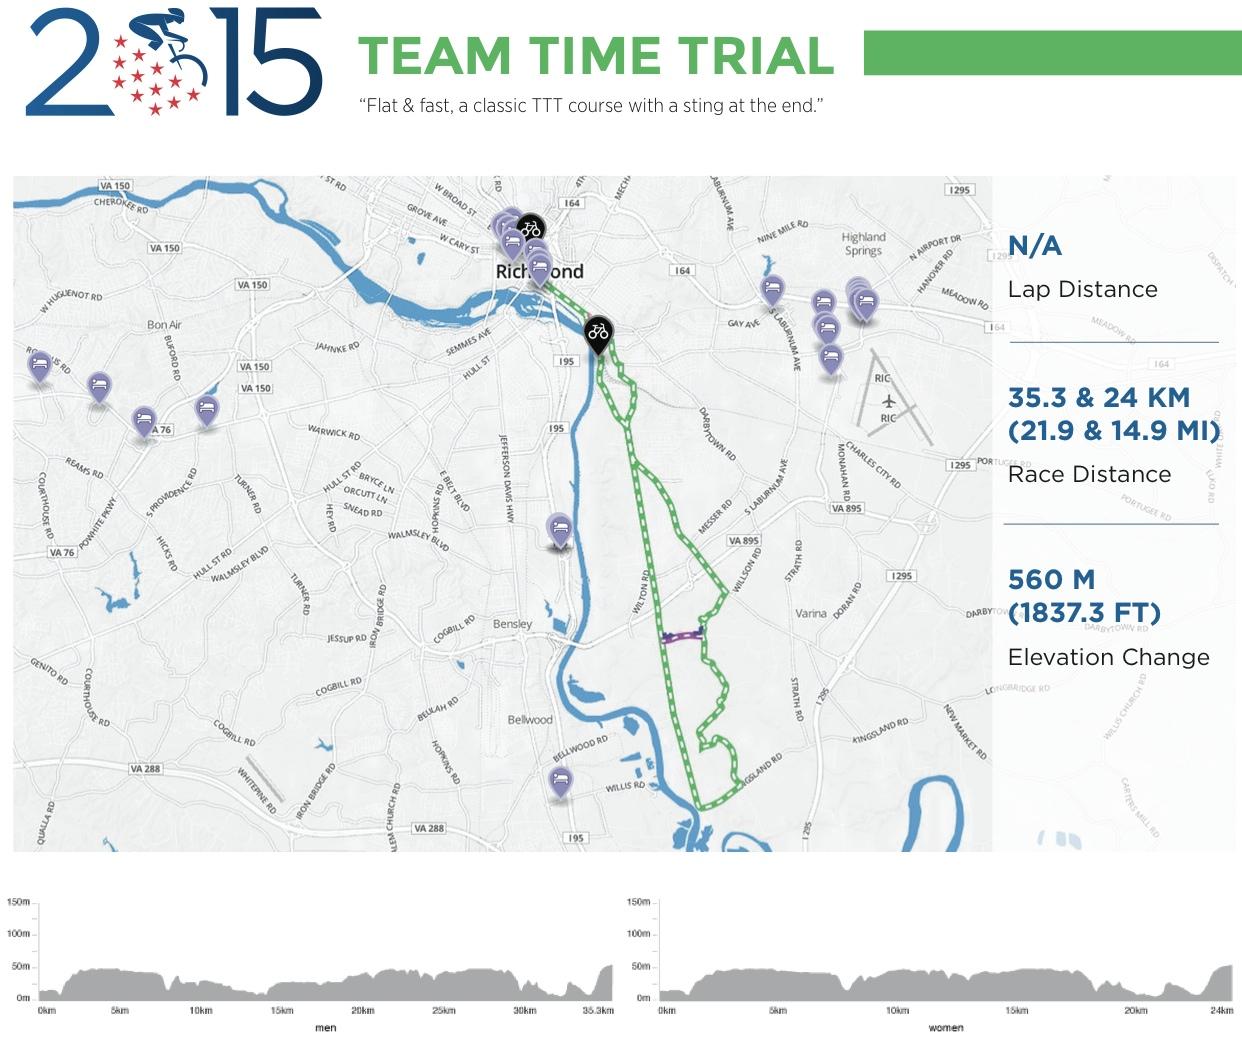 2015TeamTimeTrial